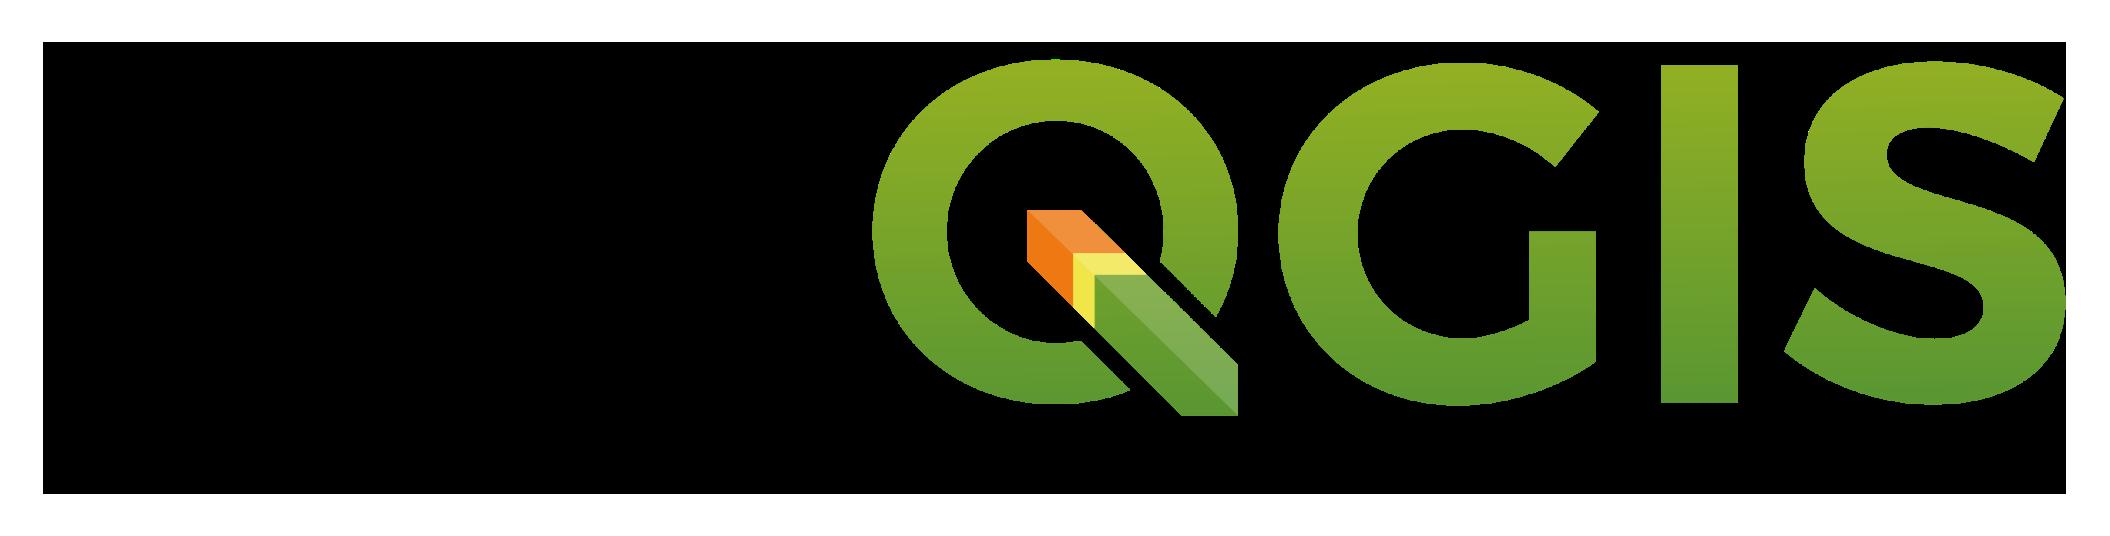 logo_hfc_00